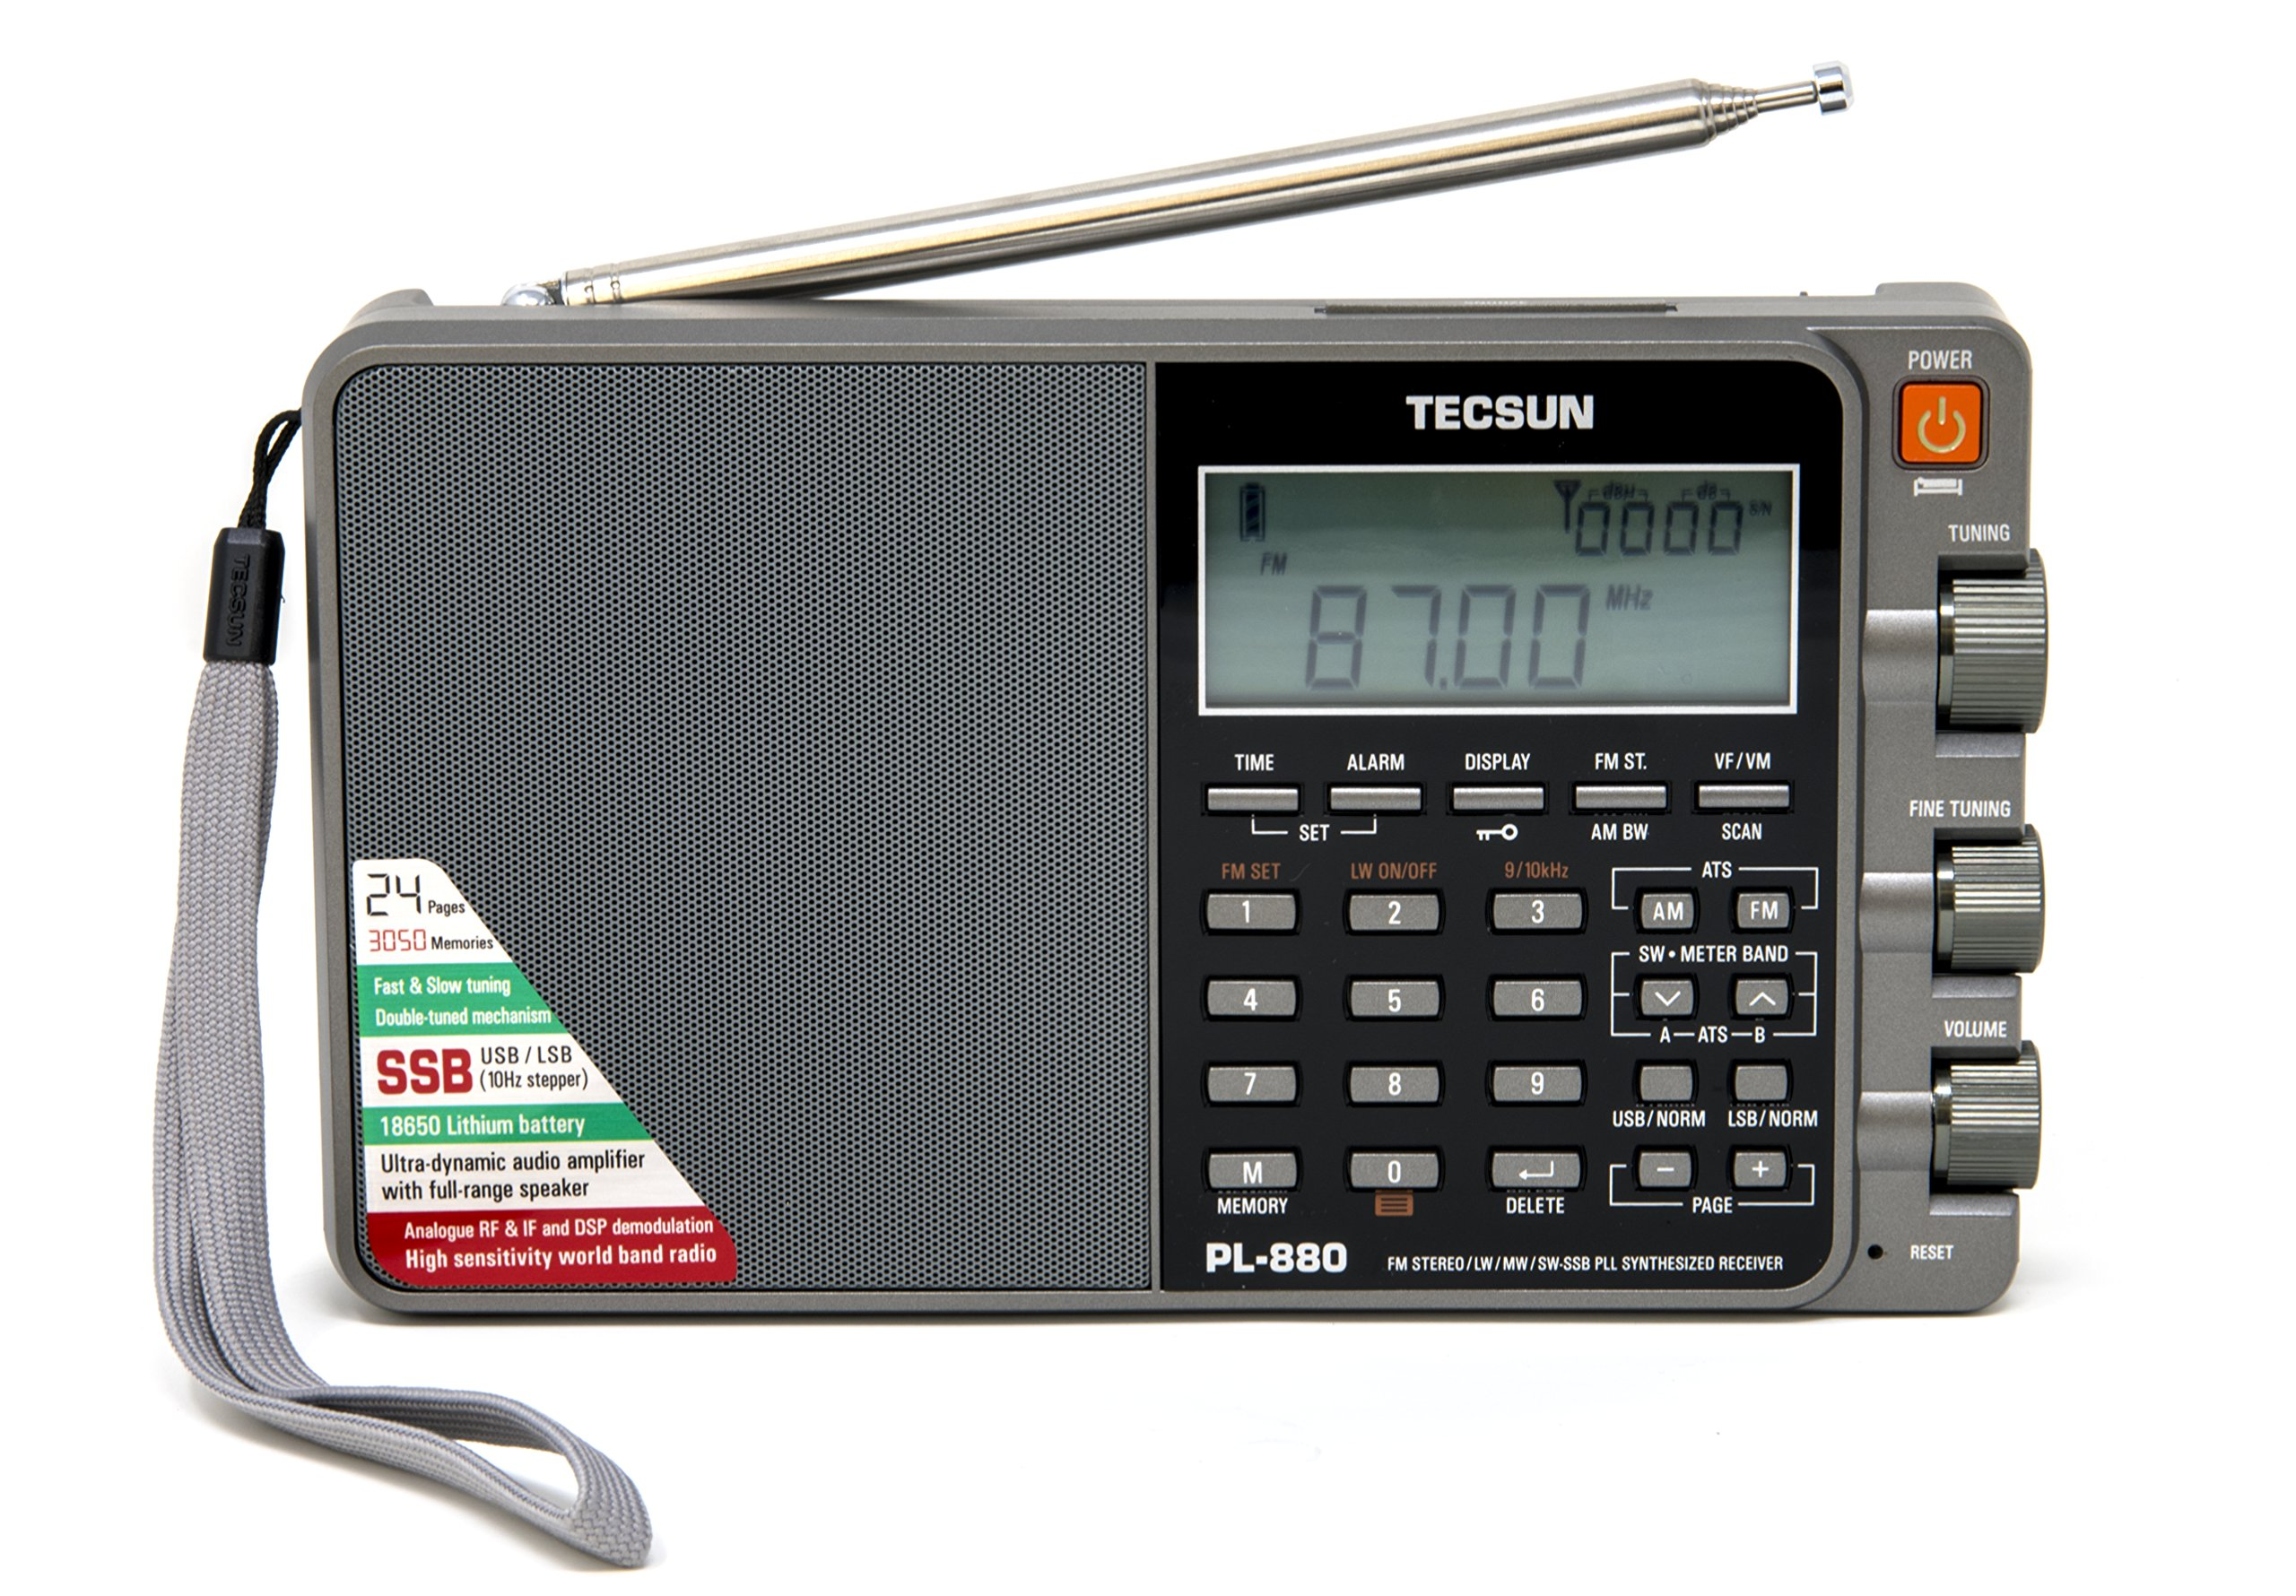 Tecsun PL880 Portable Digital PLL Dual Conversion AM/FM, Longwave & Shortwave Radio with SSB (Single Side Band) Reception, Color Silver by Tecsun